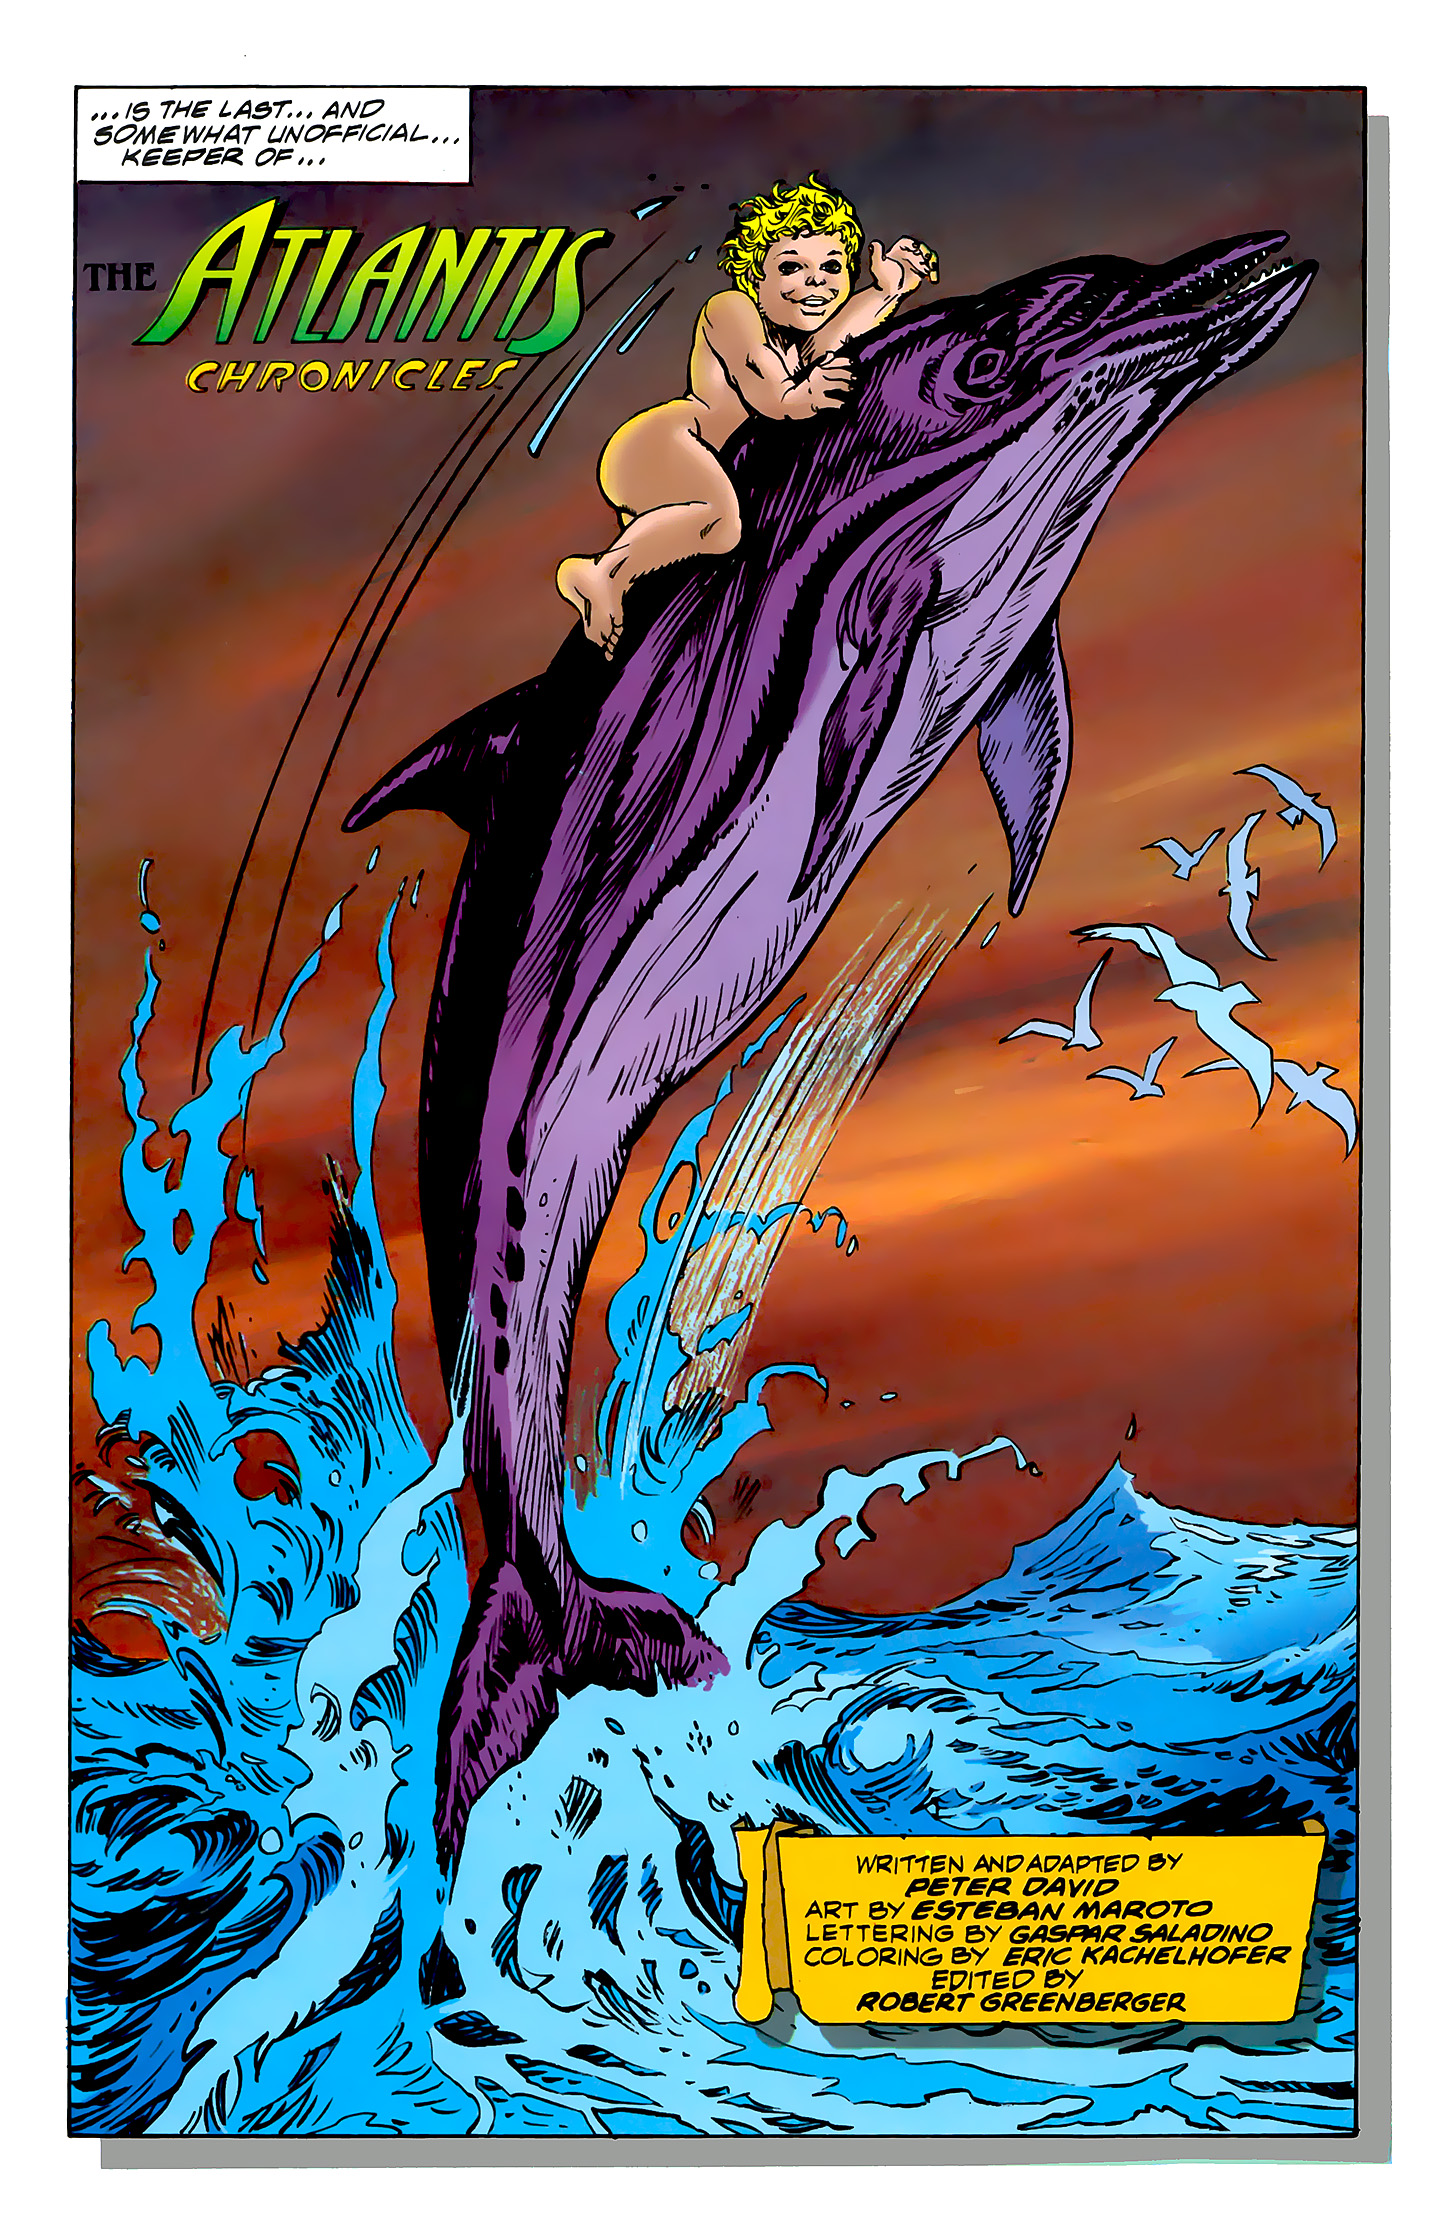 Read online Atlantis Chronicles comic -  Issue #7 - 44